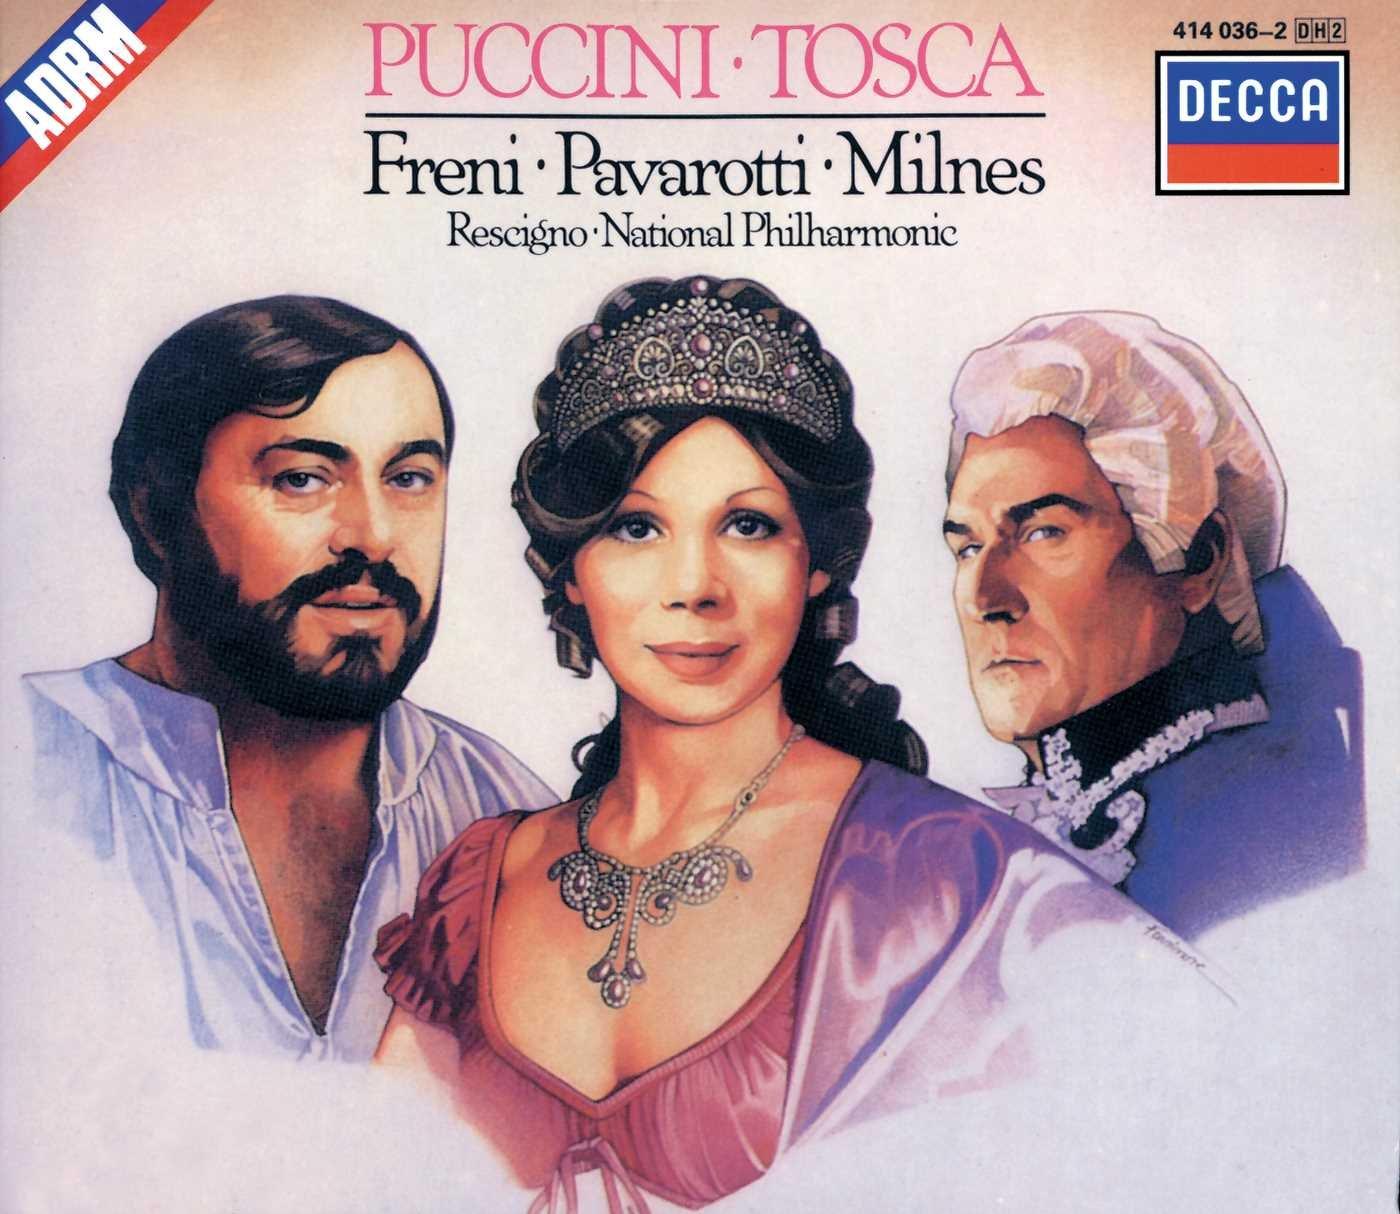 Puccini: Tosca / Freni, Pavarotti, Milnes, Rescigno, National Philharmonic by London / Decca